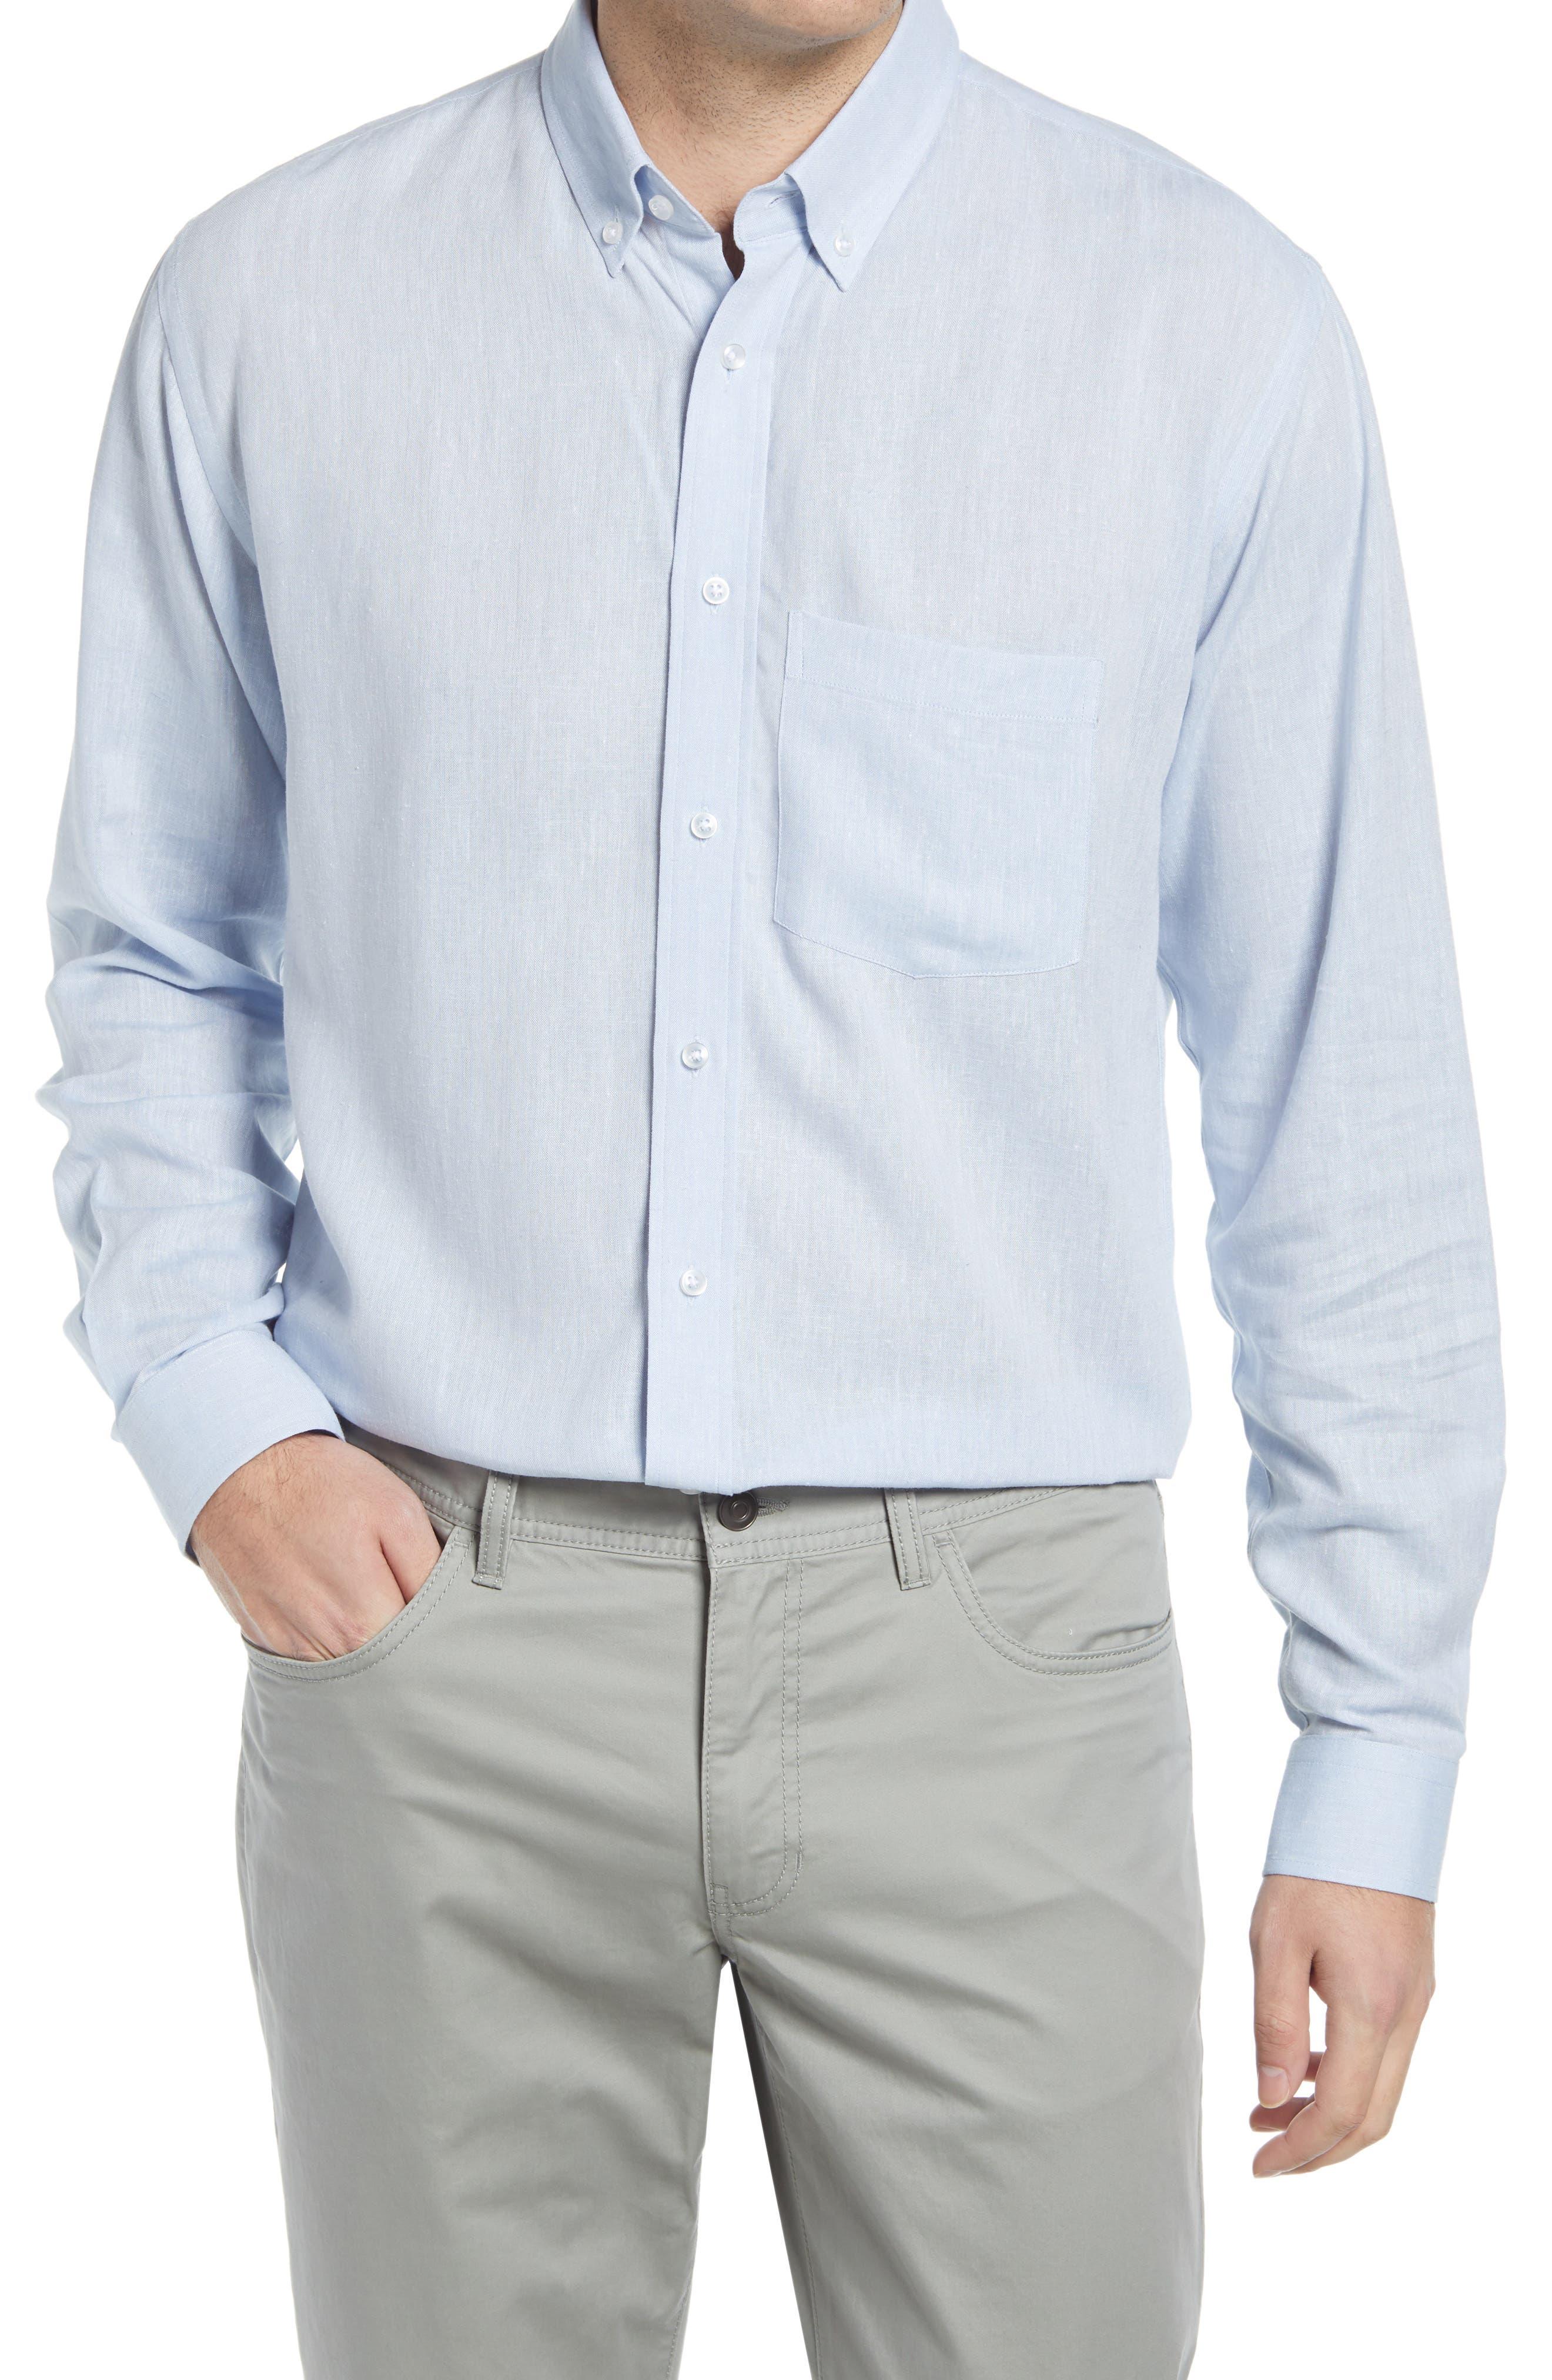 Howard Tailored Fit Cotton & Linen Button-Down Shirt